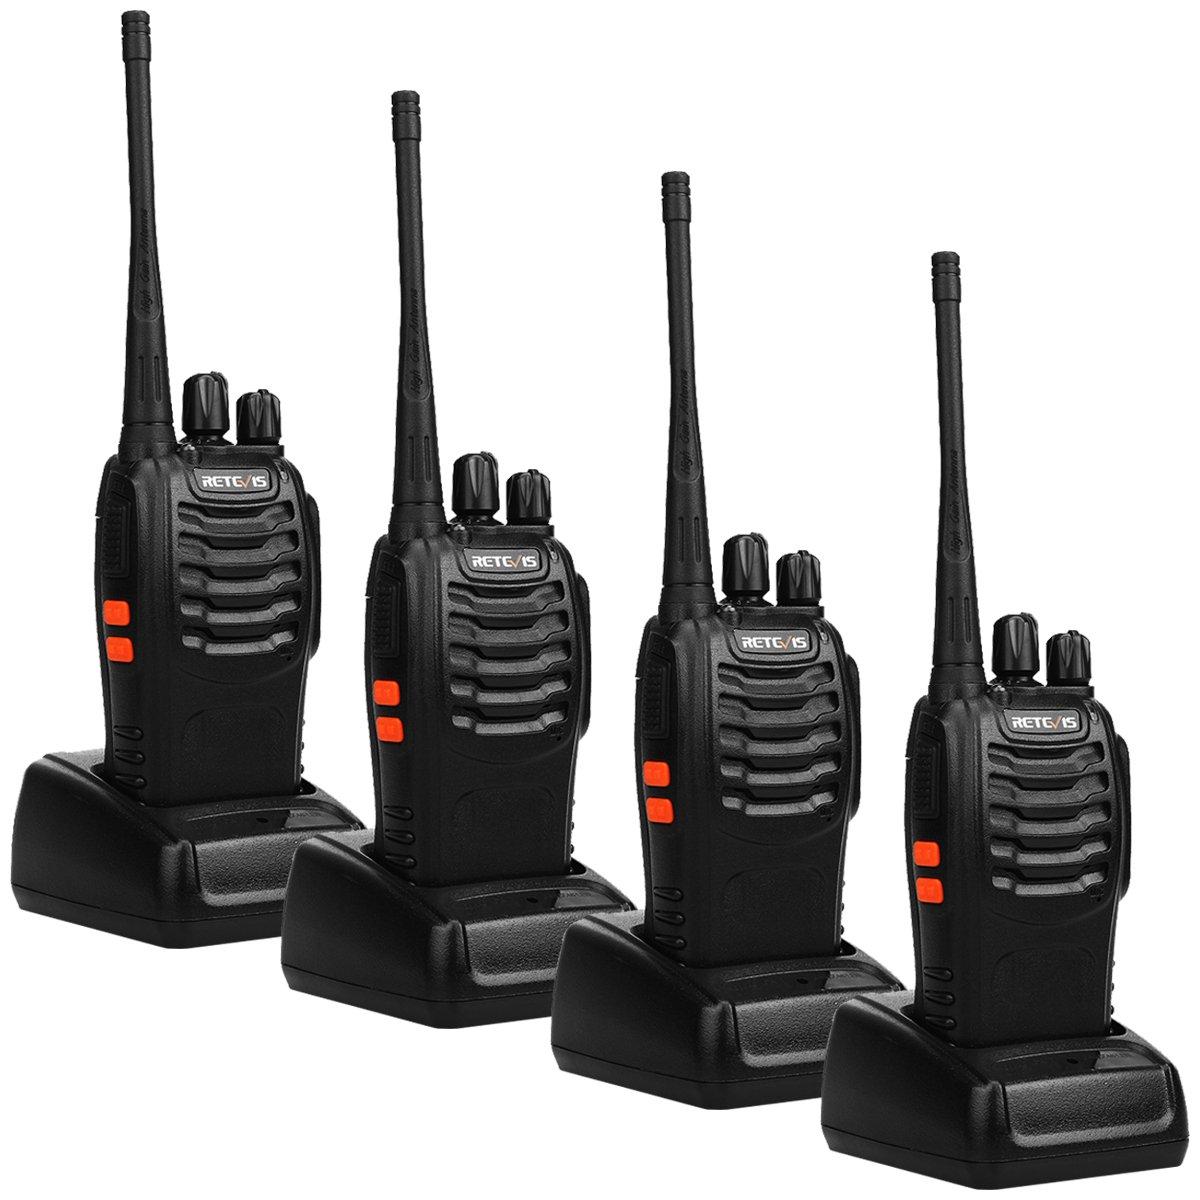 Retevis H-777 Two Way Radio UHF 400-470MHz 16CH Flashlight Walkie Talkies(4 Pack)